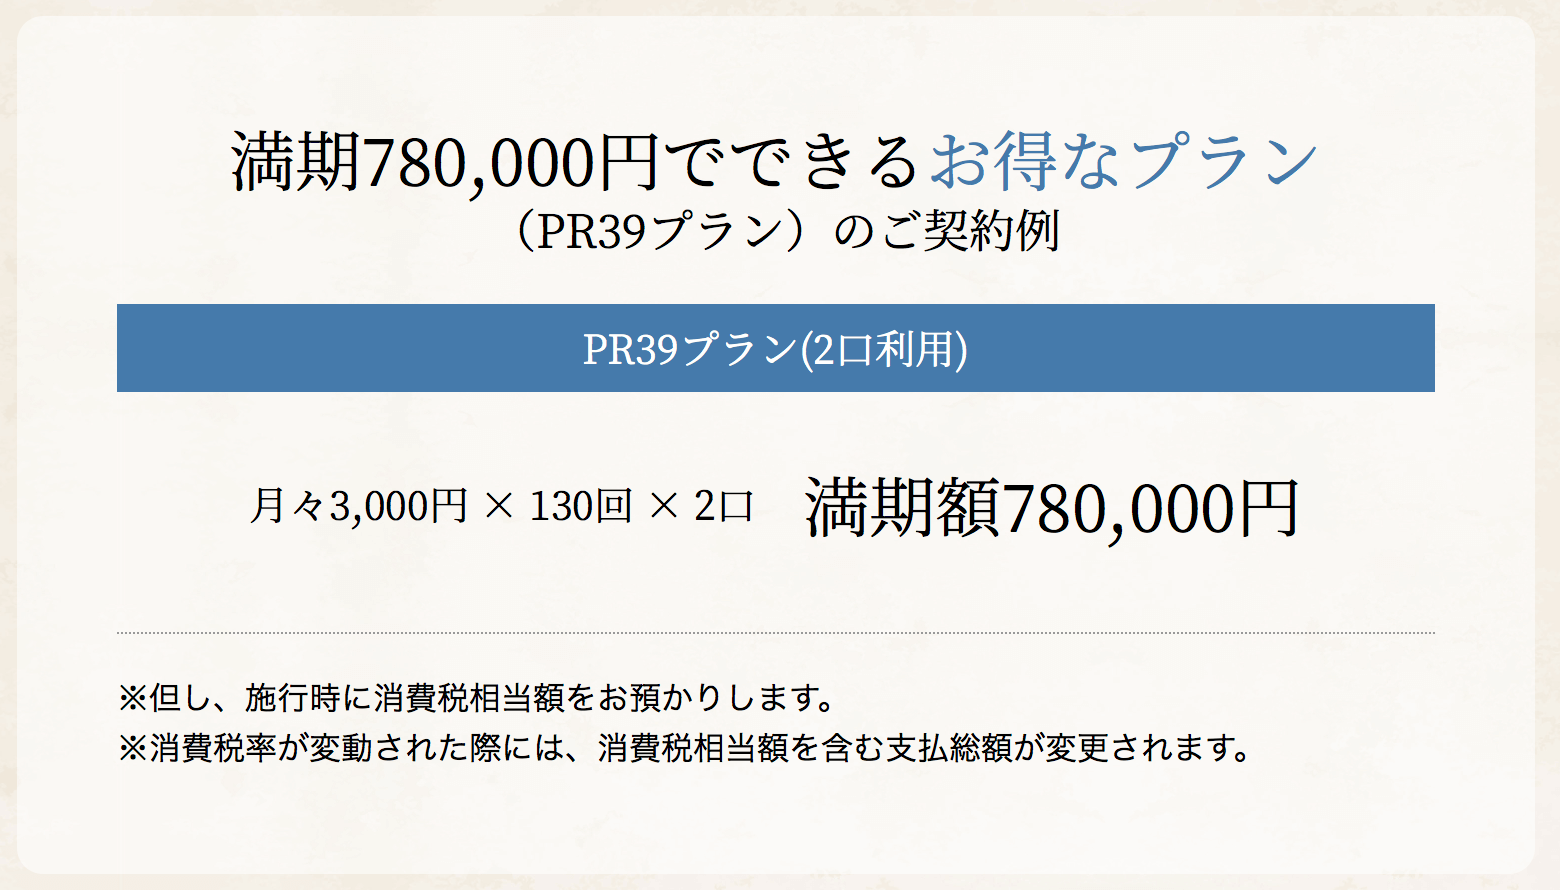 PR39プラン×2